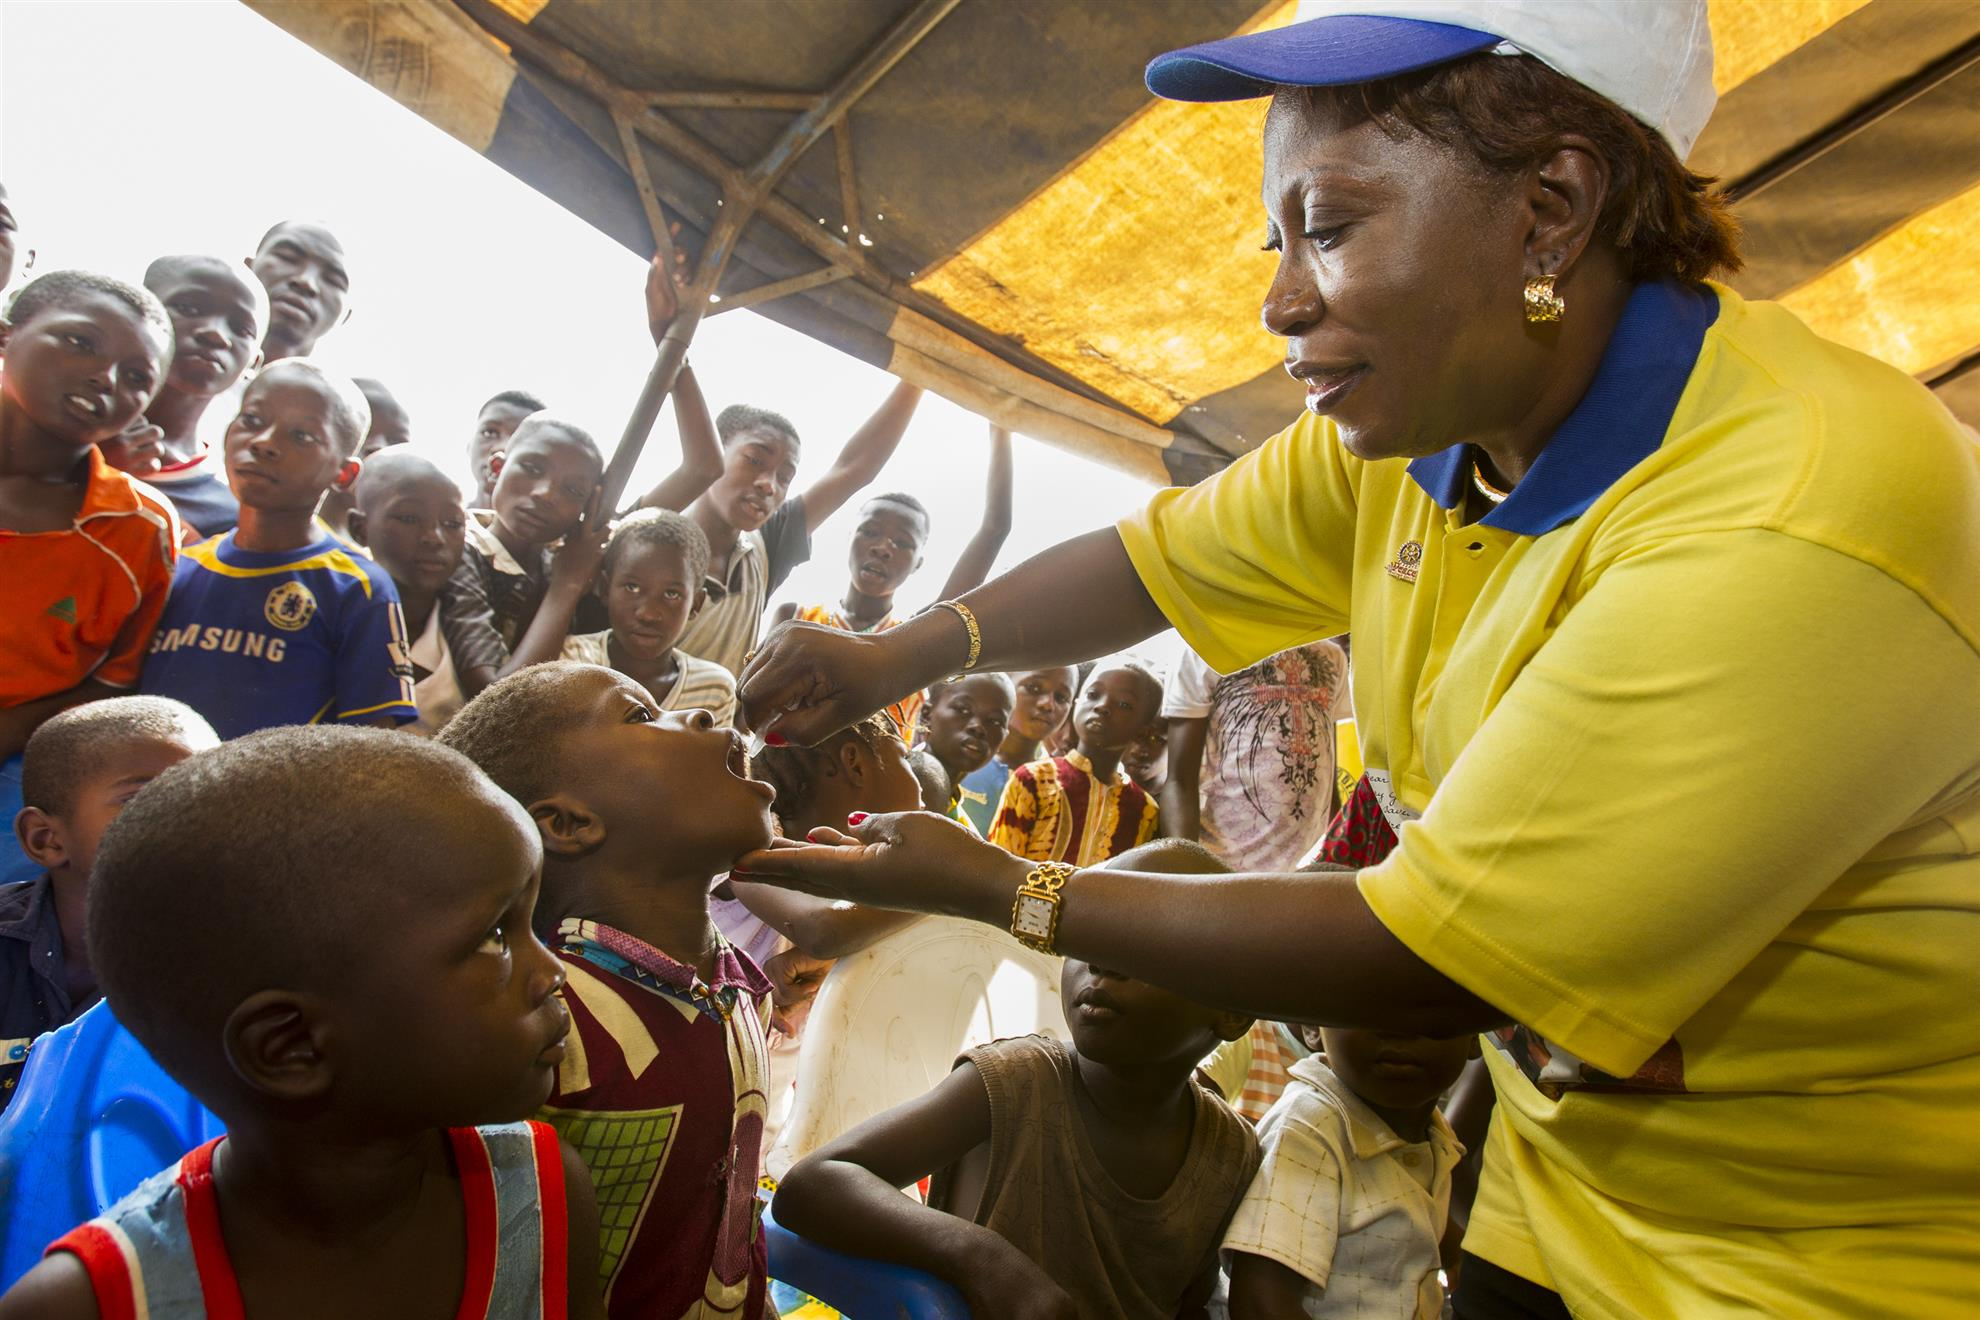 Polio mainly affects children under age 5.